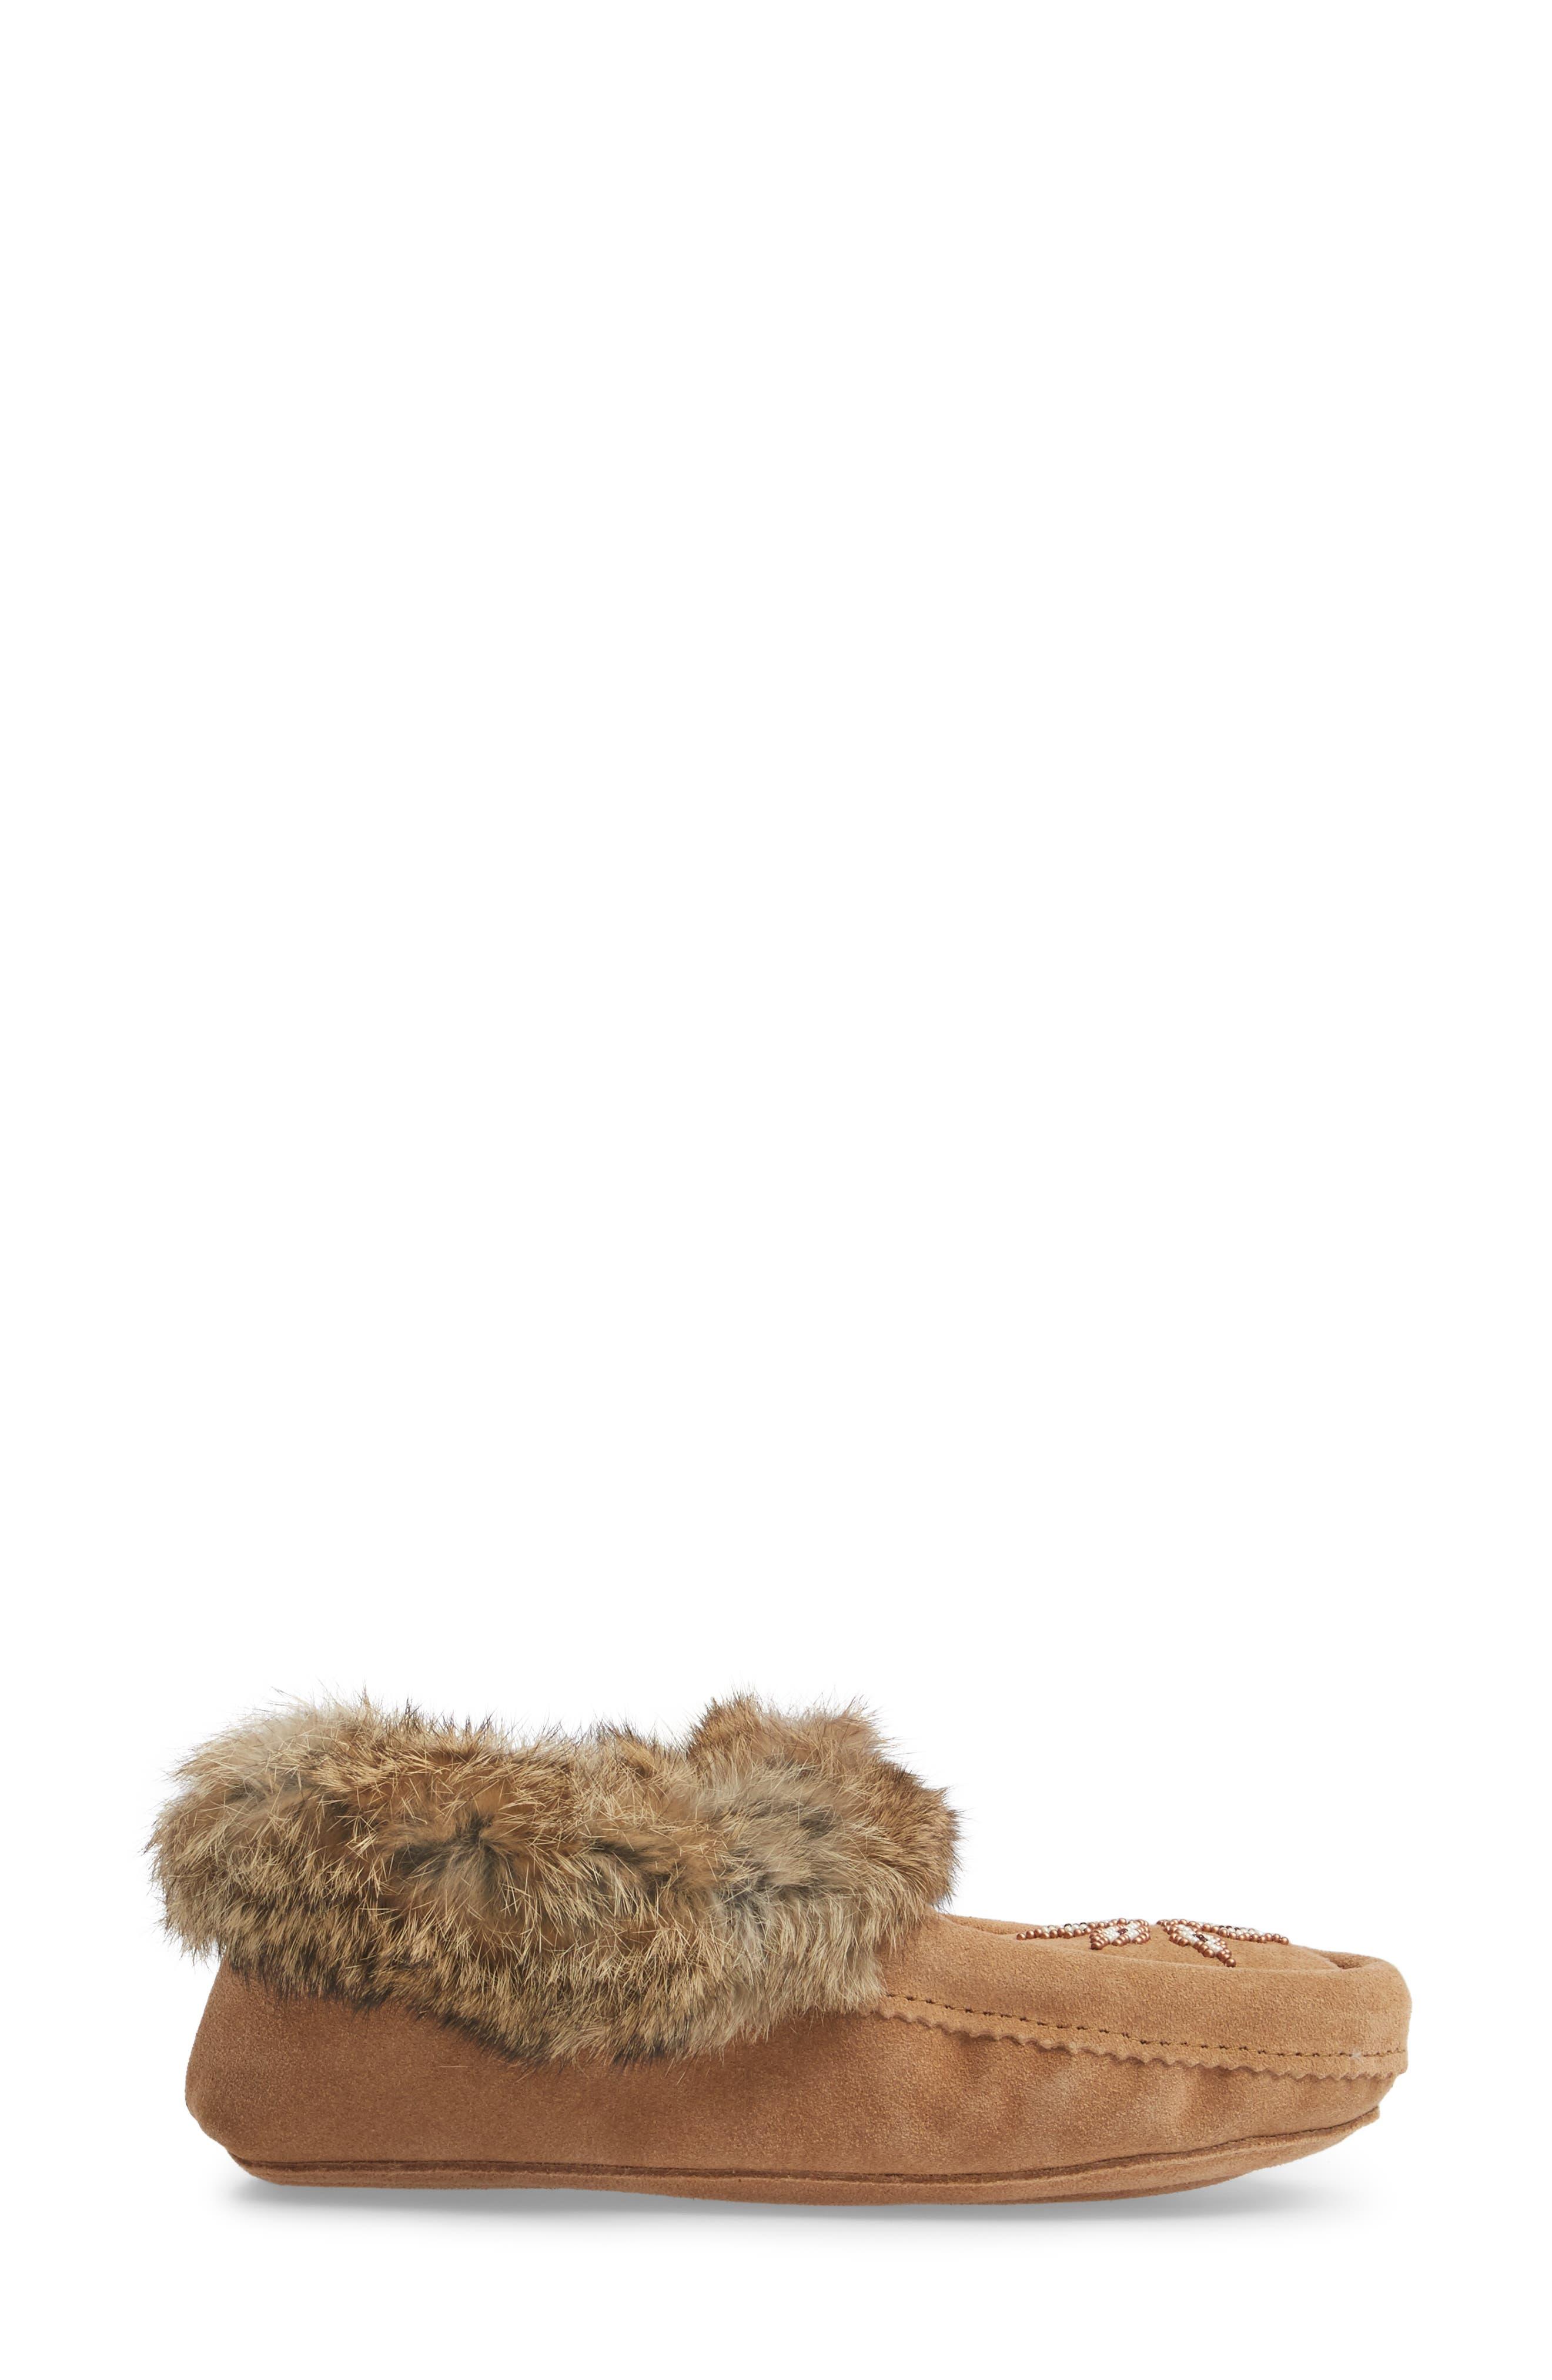 'Kanada' Genuine Rabbit Fur & Suede Moccasin Slipper,                             Alternate thumbnail 3, color,                             OAK FUR